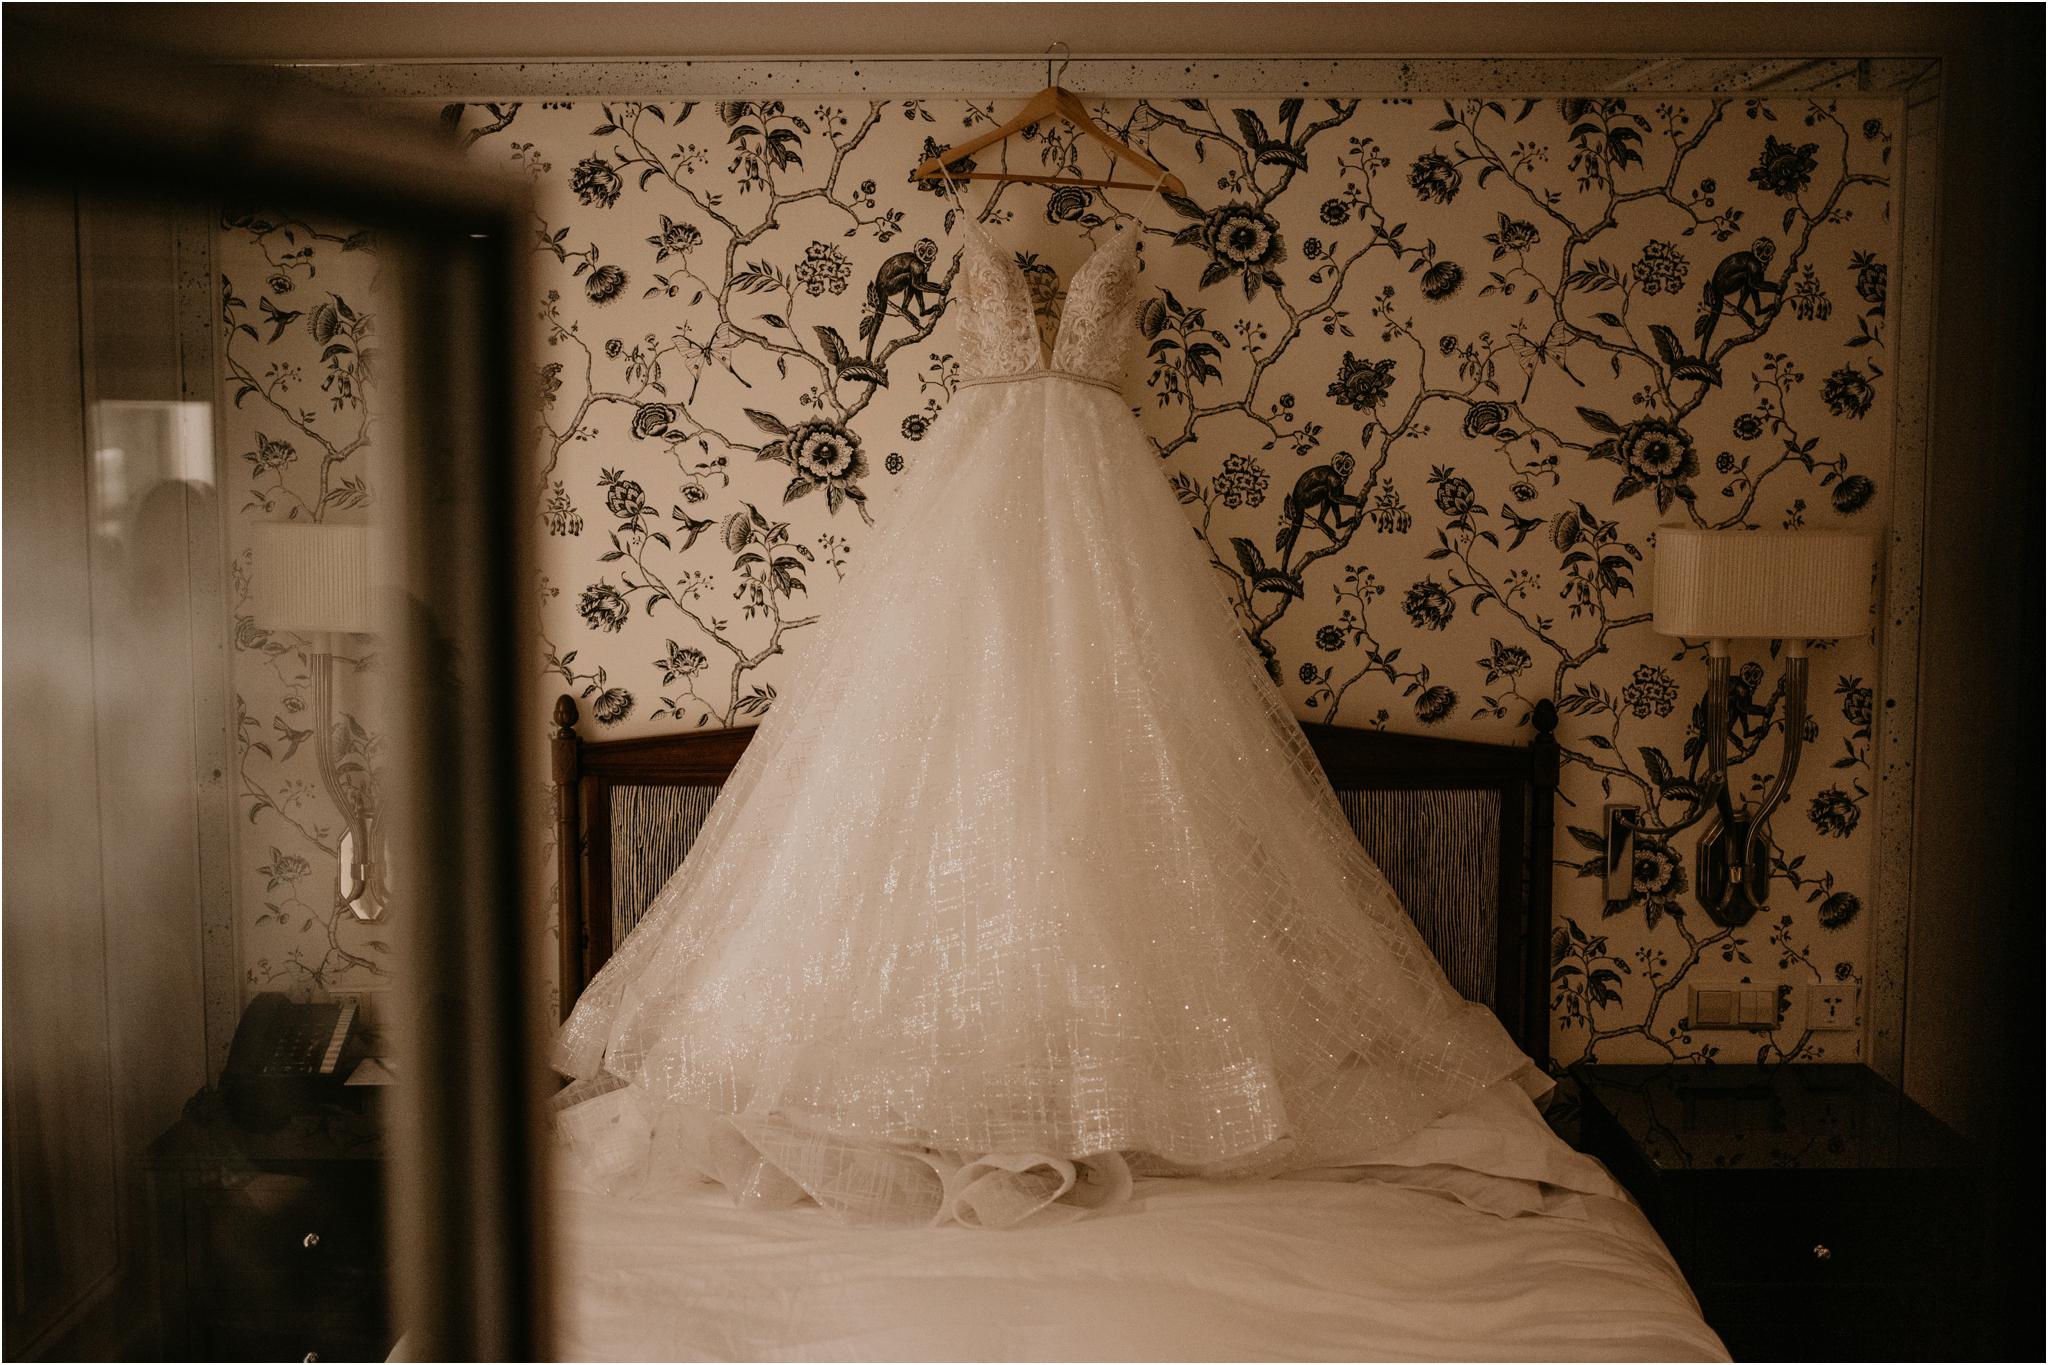 miranda-and-jared-paris-elopement-destination-wedding-photographer-001.jpg